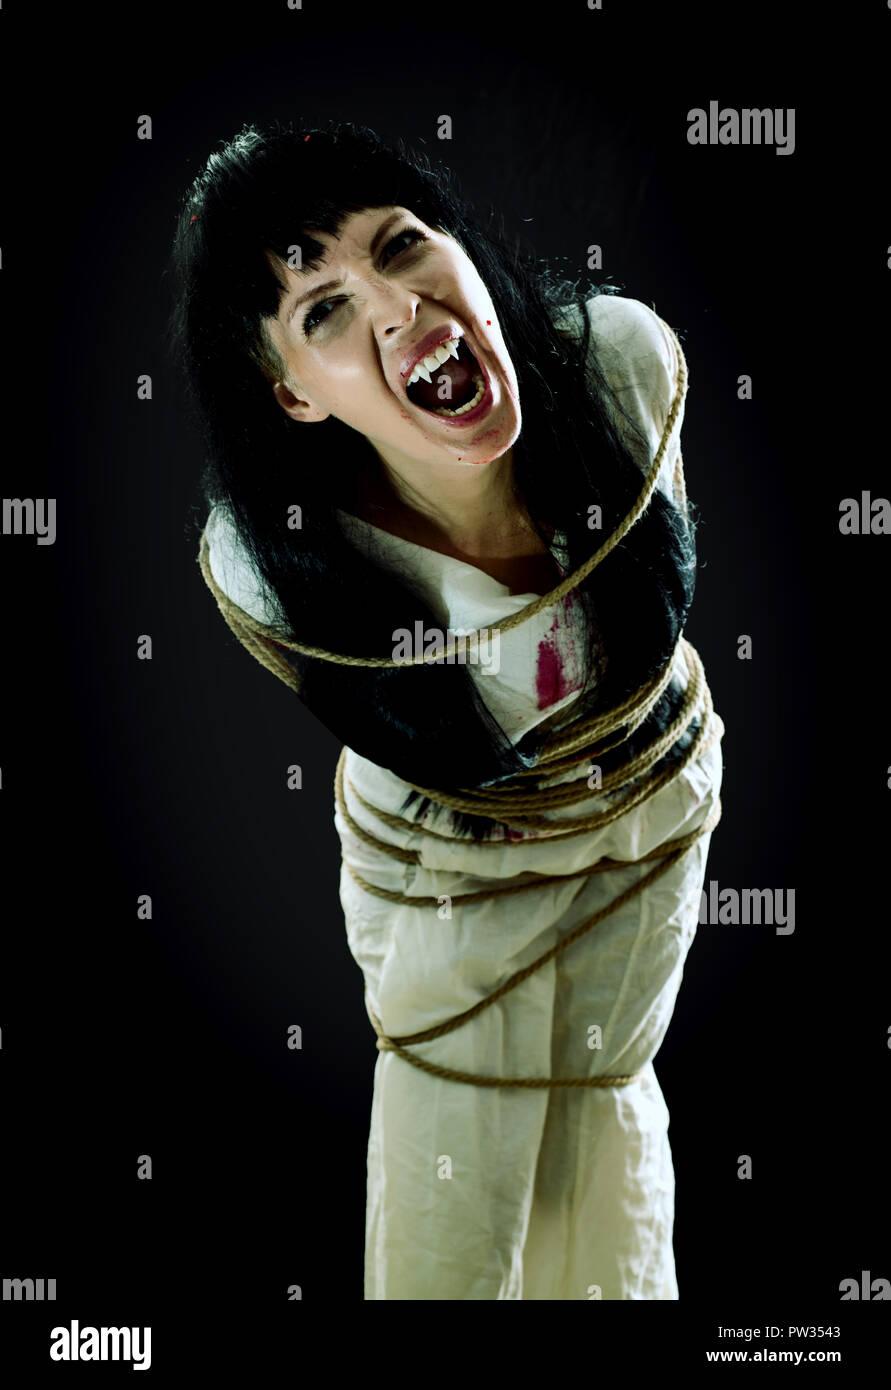 Halloween horror  Crazy bloody scary zombie vampire woman